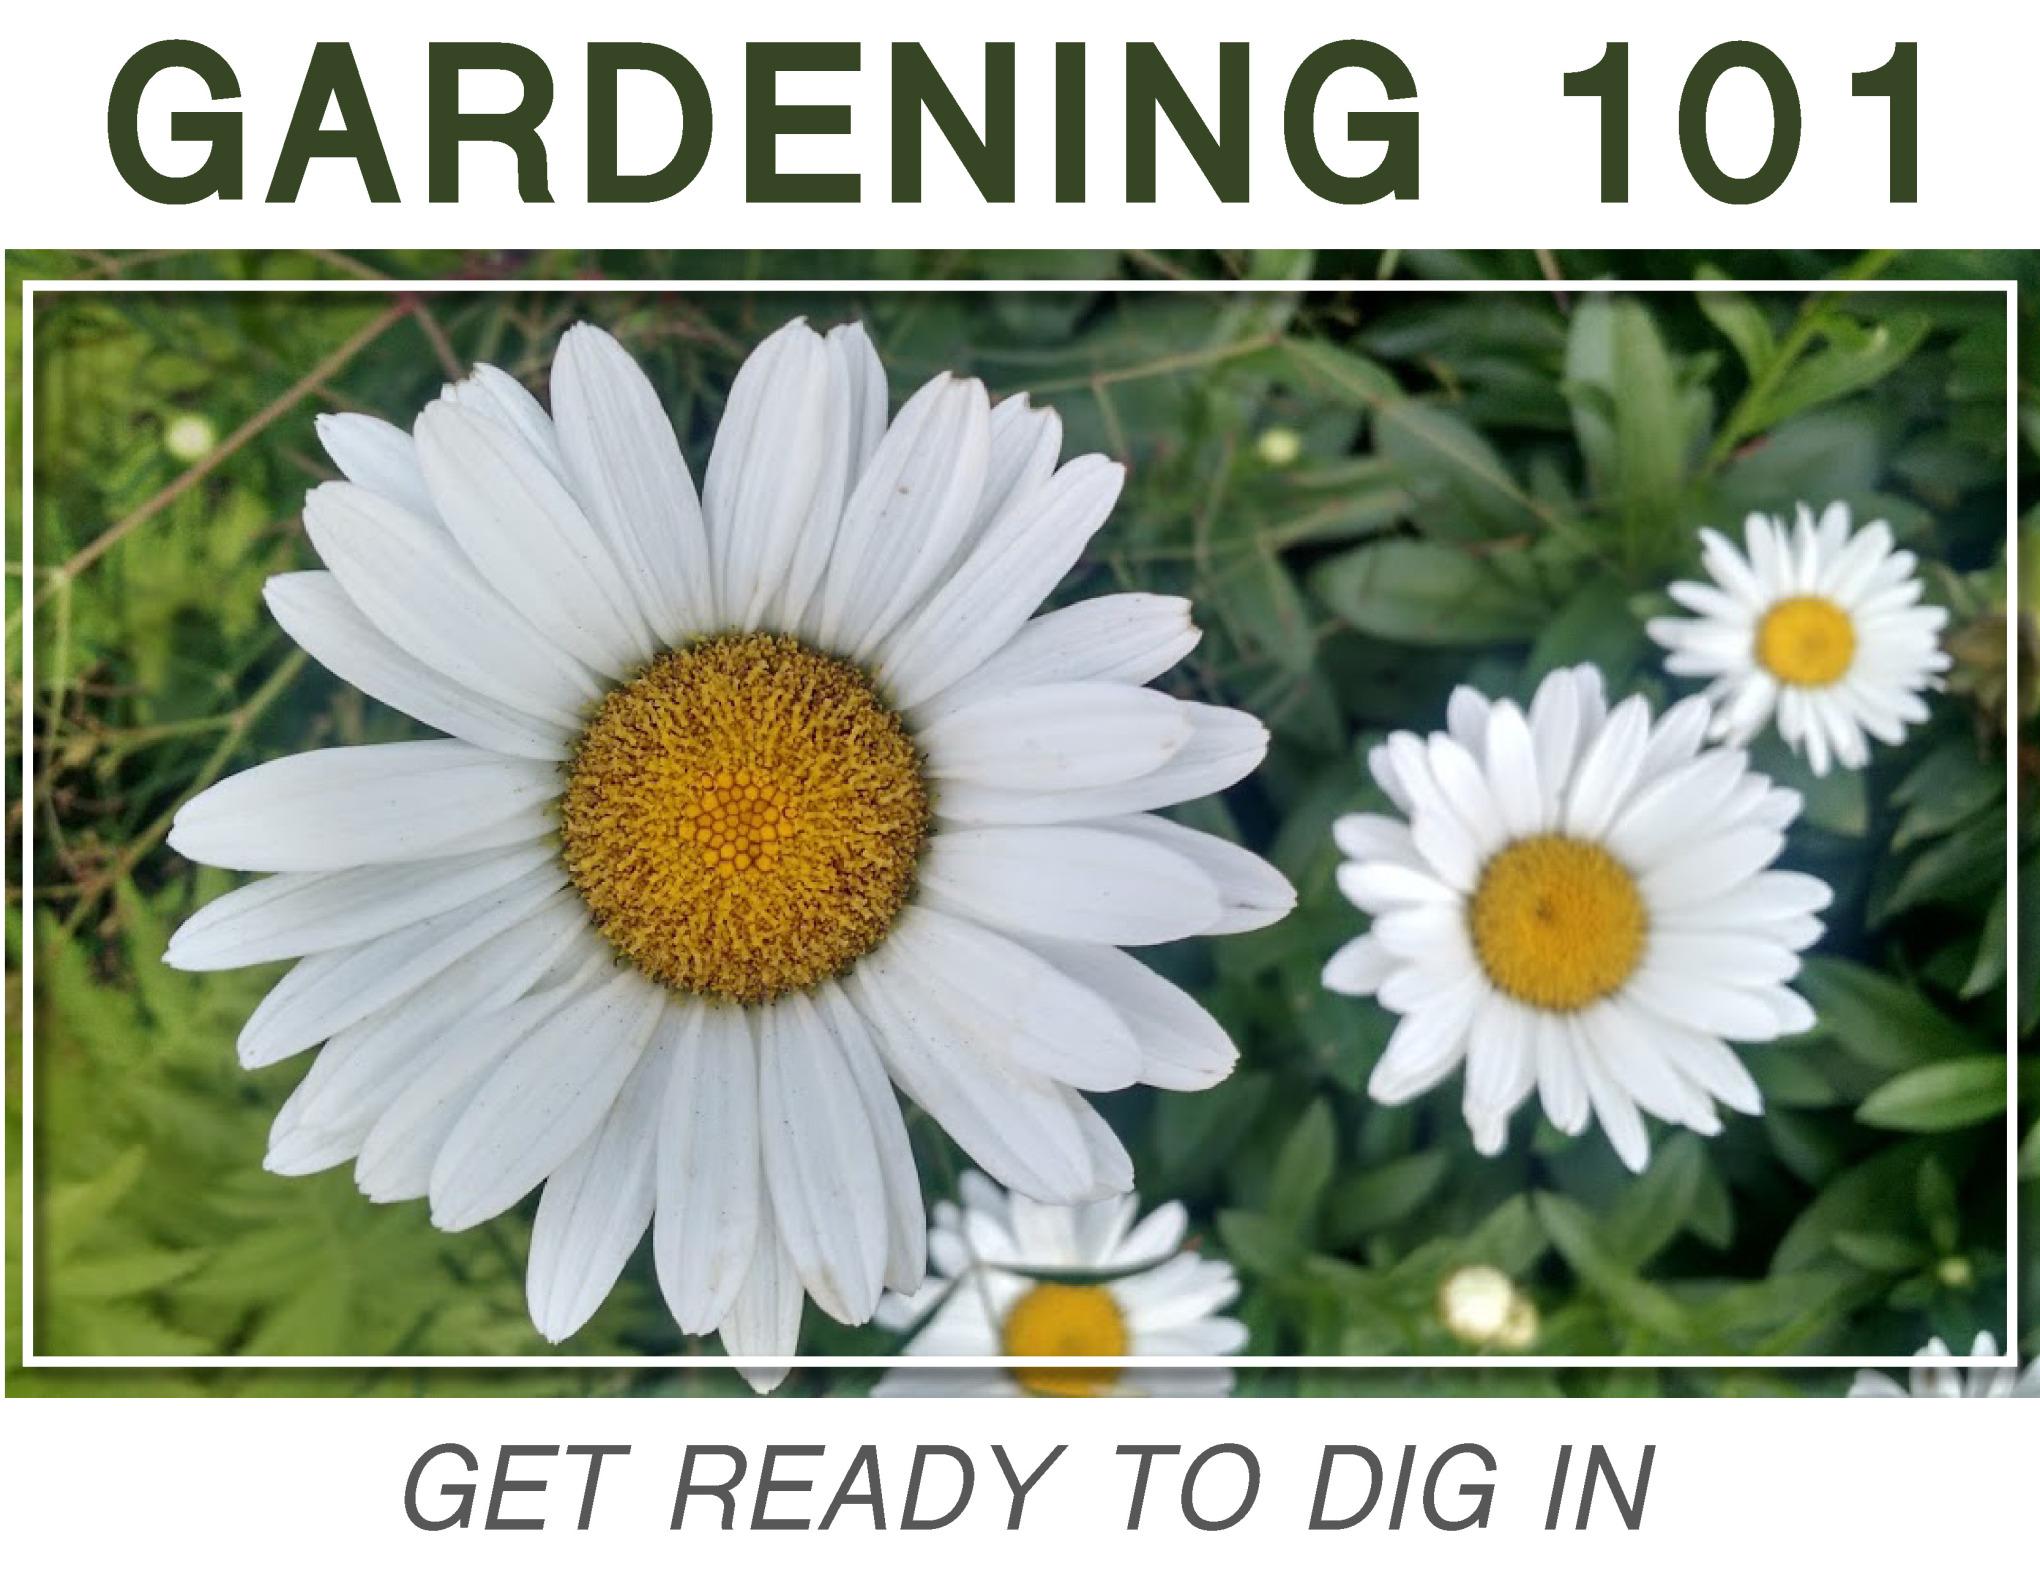 gardening-101_2018.jpg